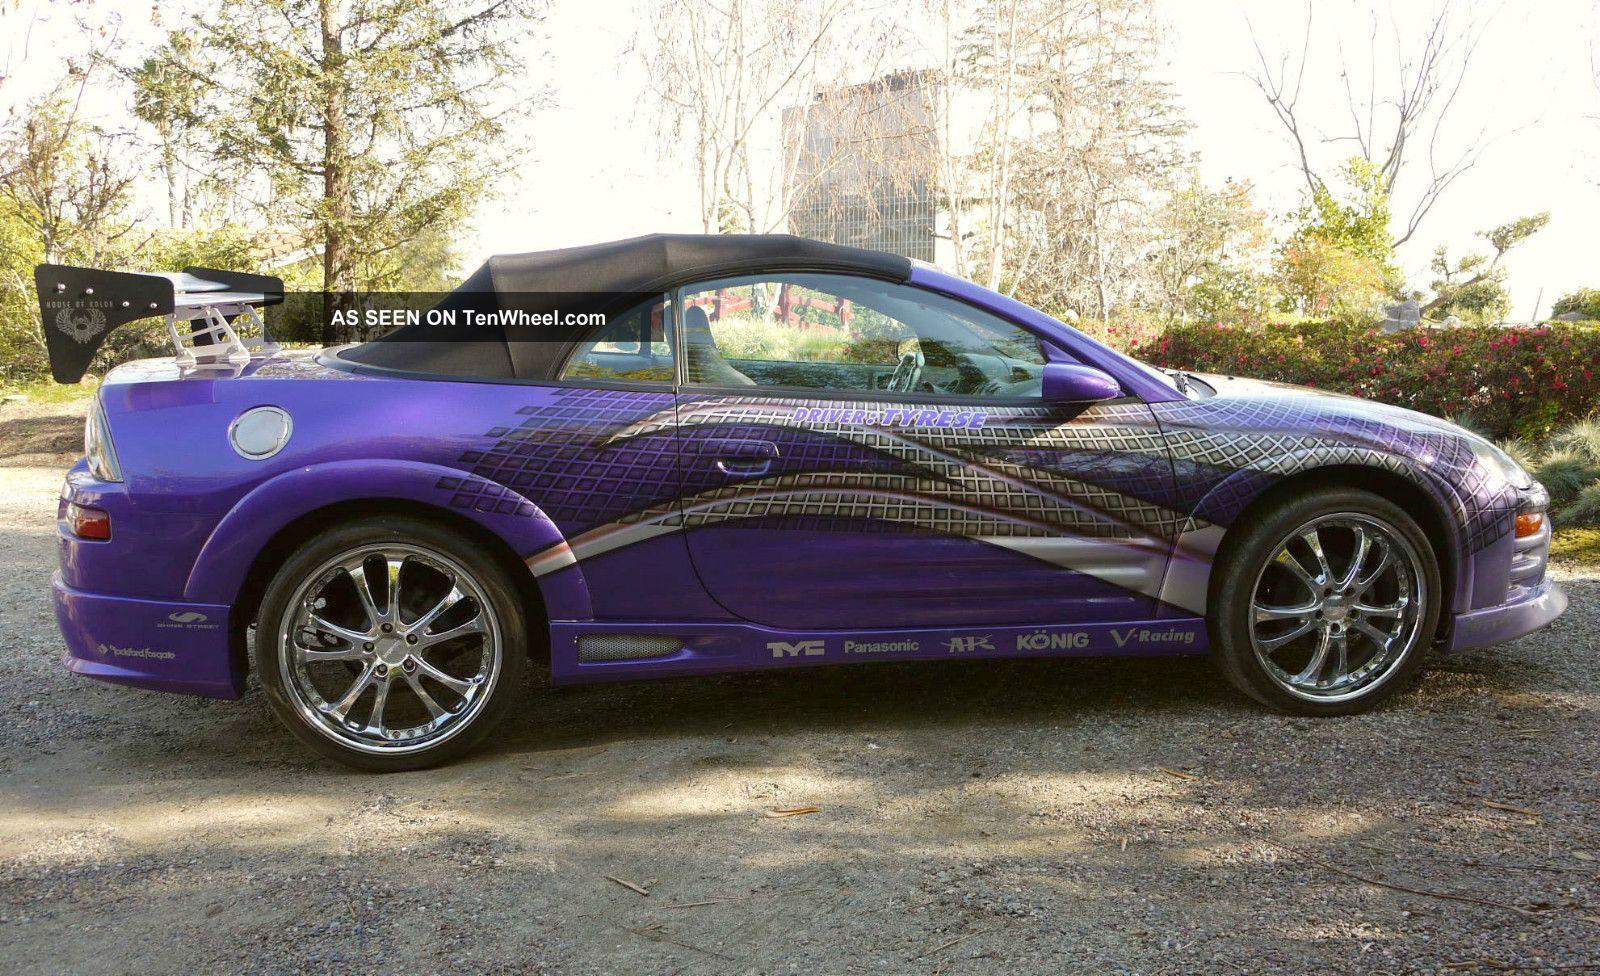 2003 Mitsubishi Eclipse Spyder GTS Fast & Furious